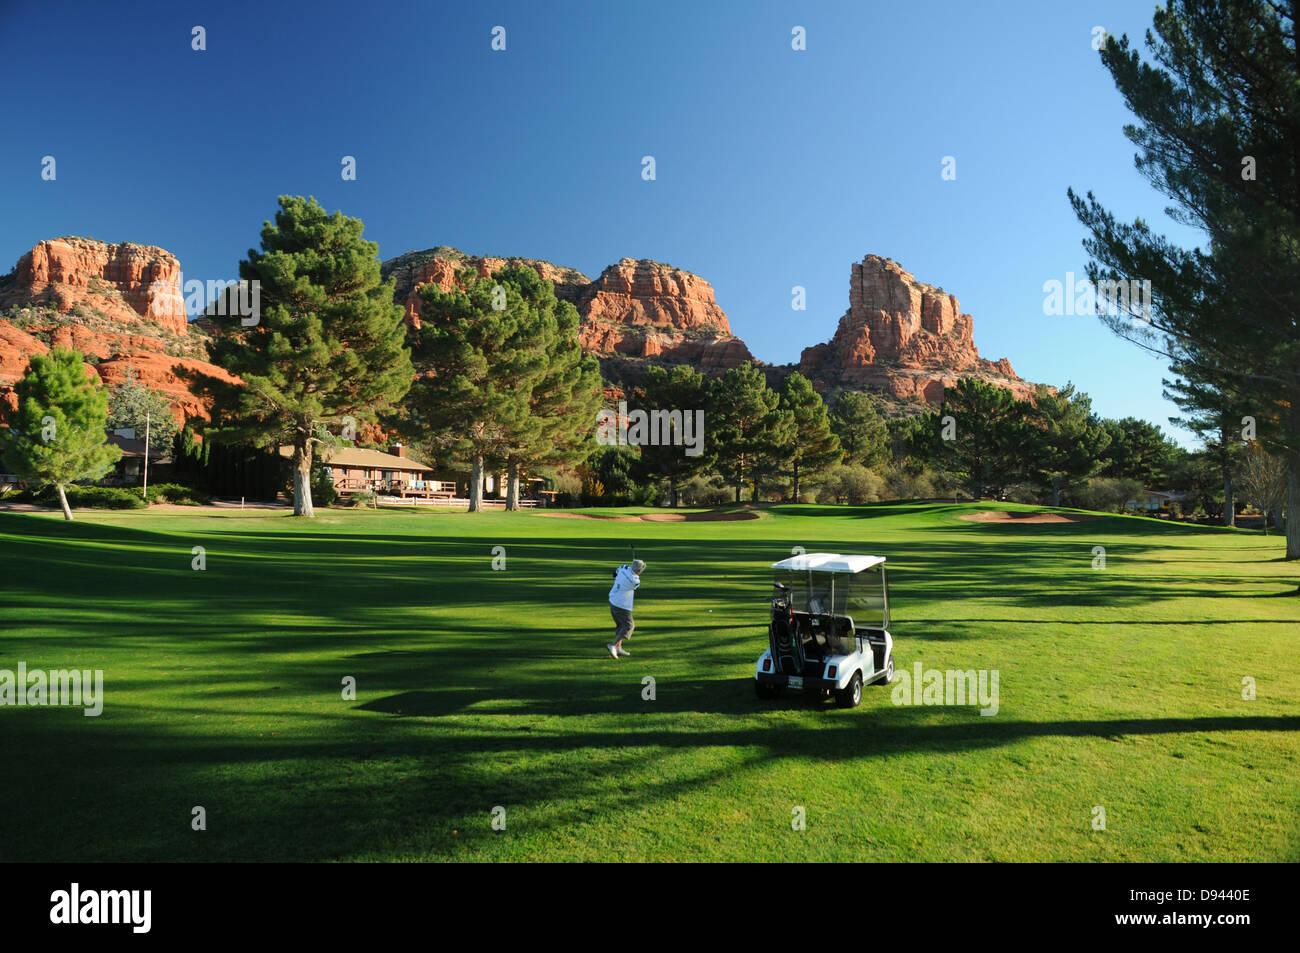 Oakcreek Country Club Golfplatz in Sedona, Arizona, umgeben von roten Felsformationen Stockbild